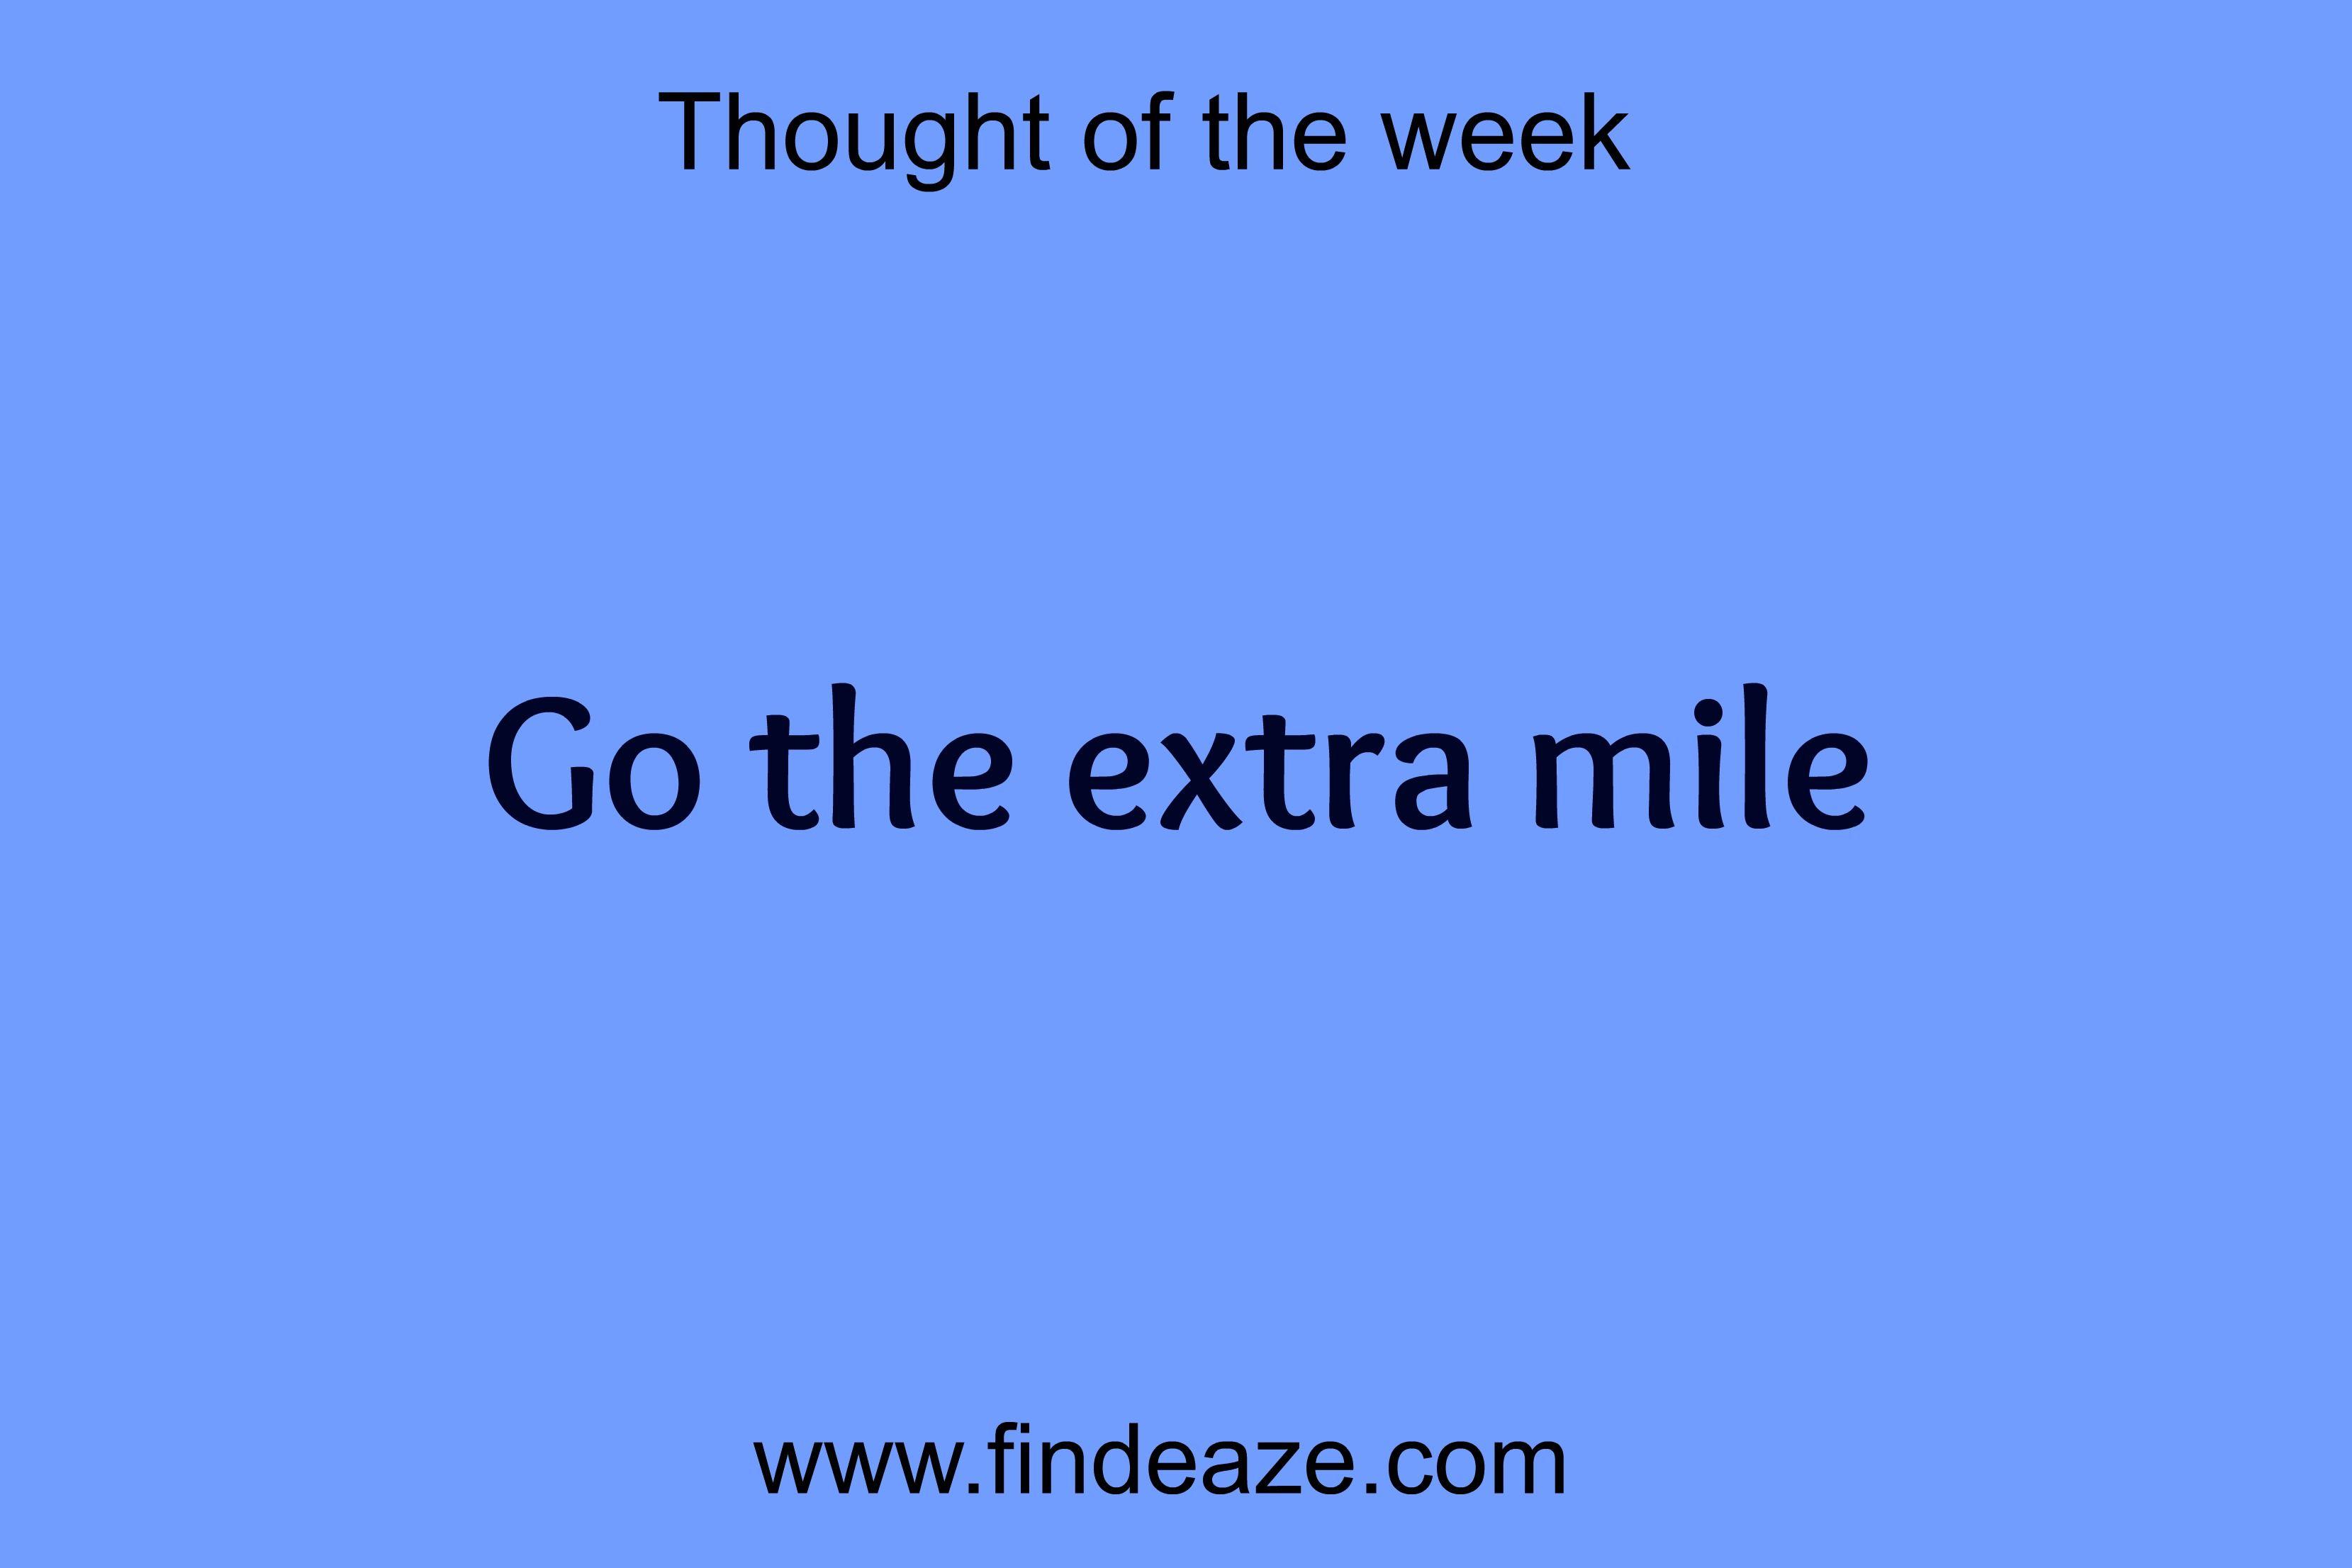 Go the extra mile #FindEaze #Weddings #Inspirationalquotes